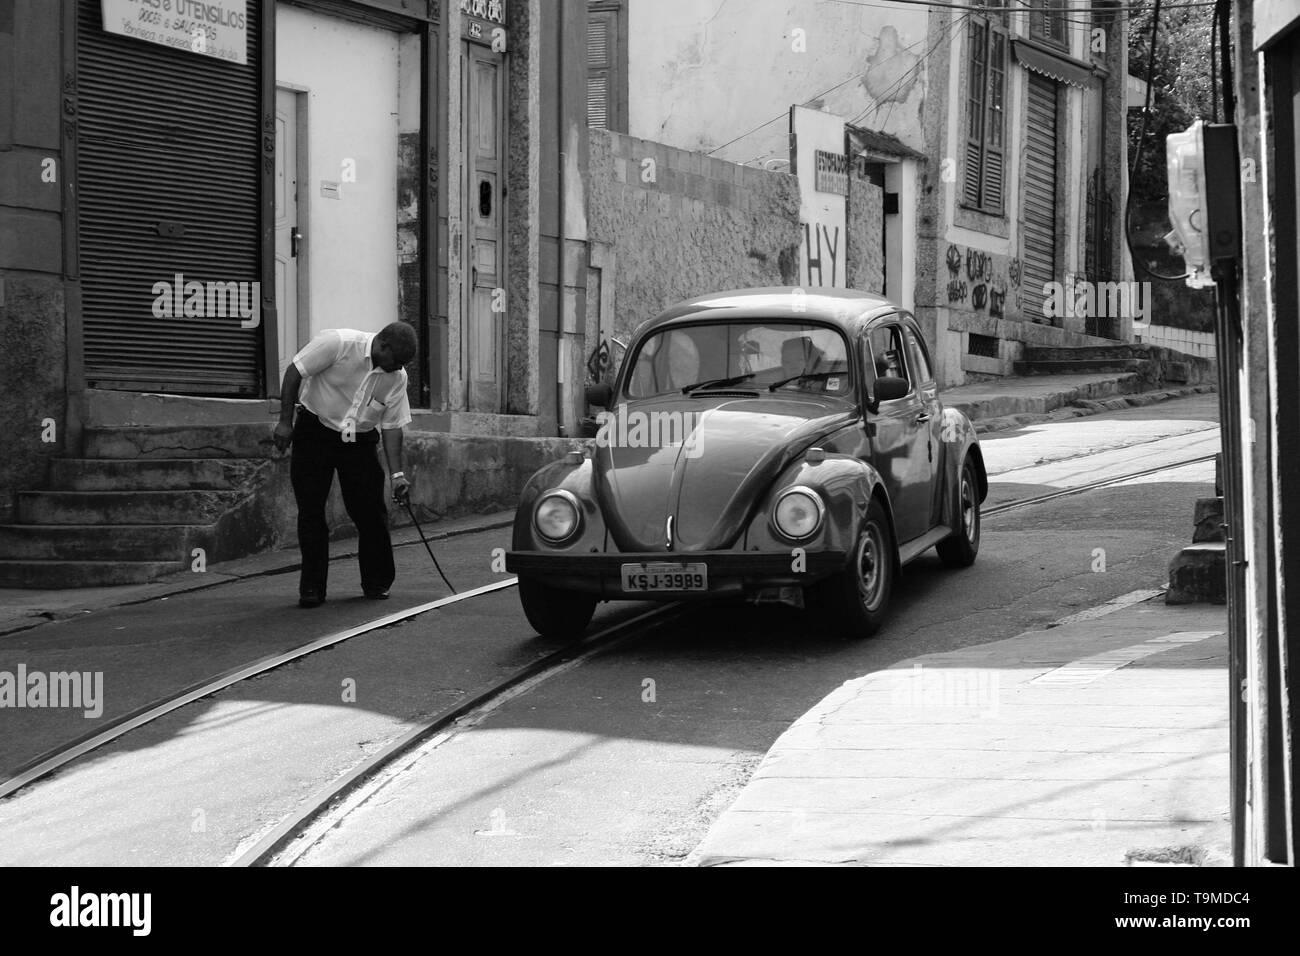 Man with VW Beetle in Rio de Janeiro - Stock Image